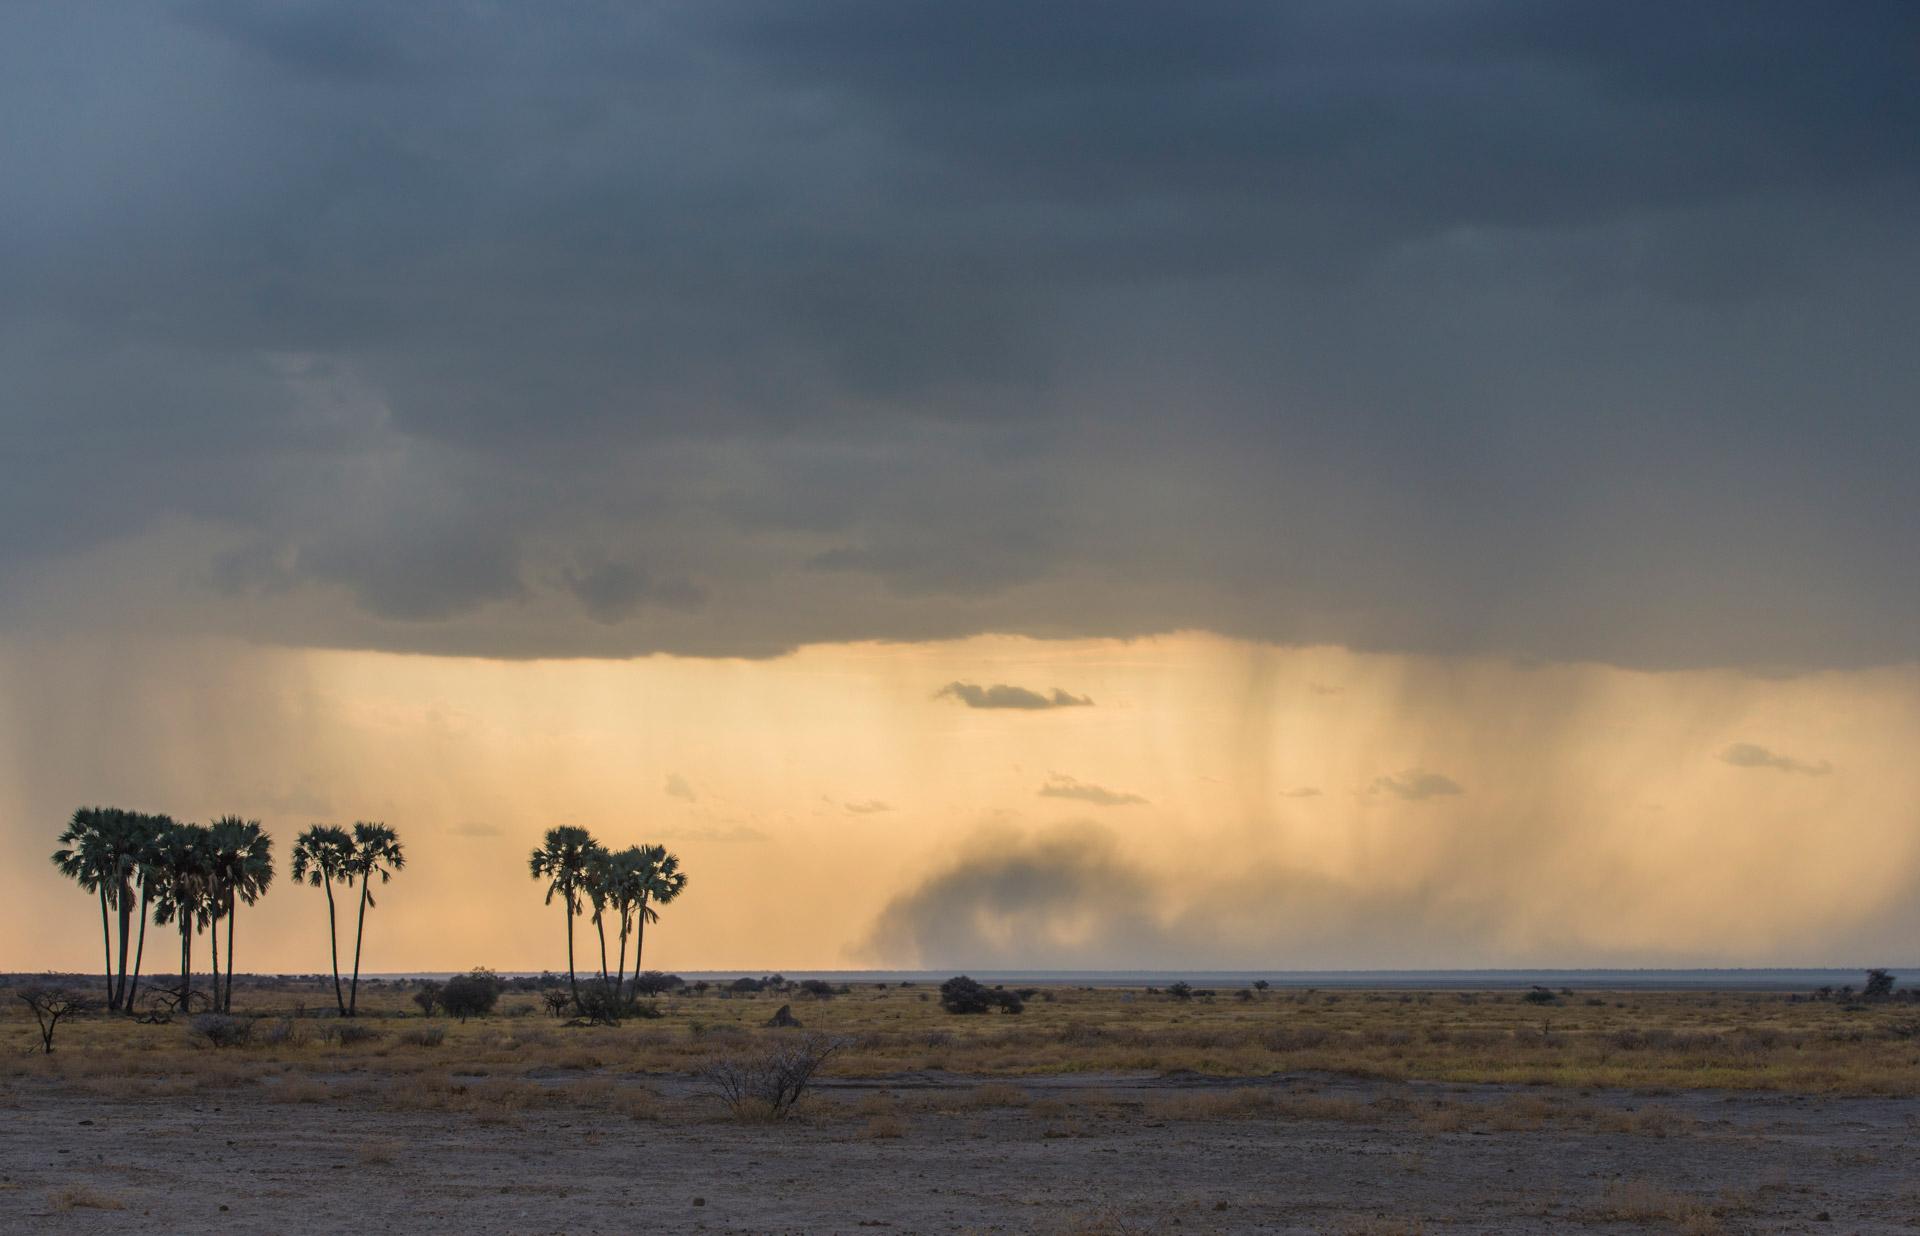 Thundershower over Fishers Pan in Etosha National Park